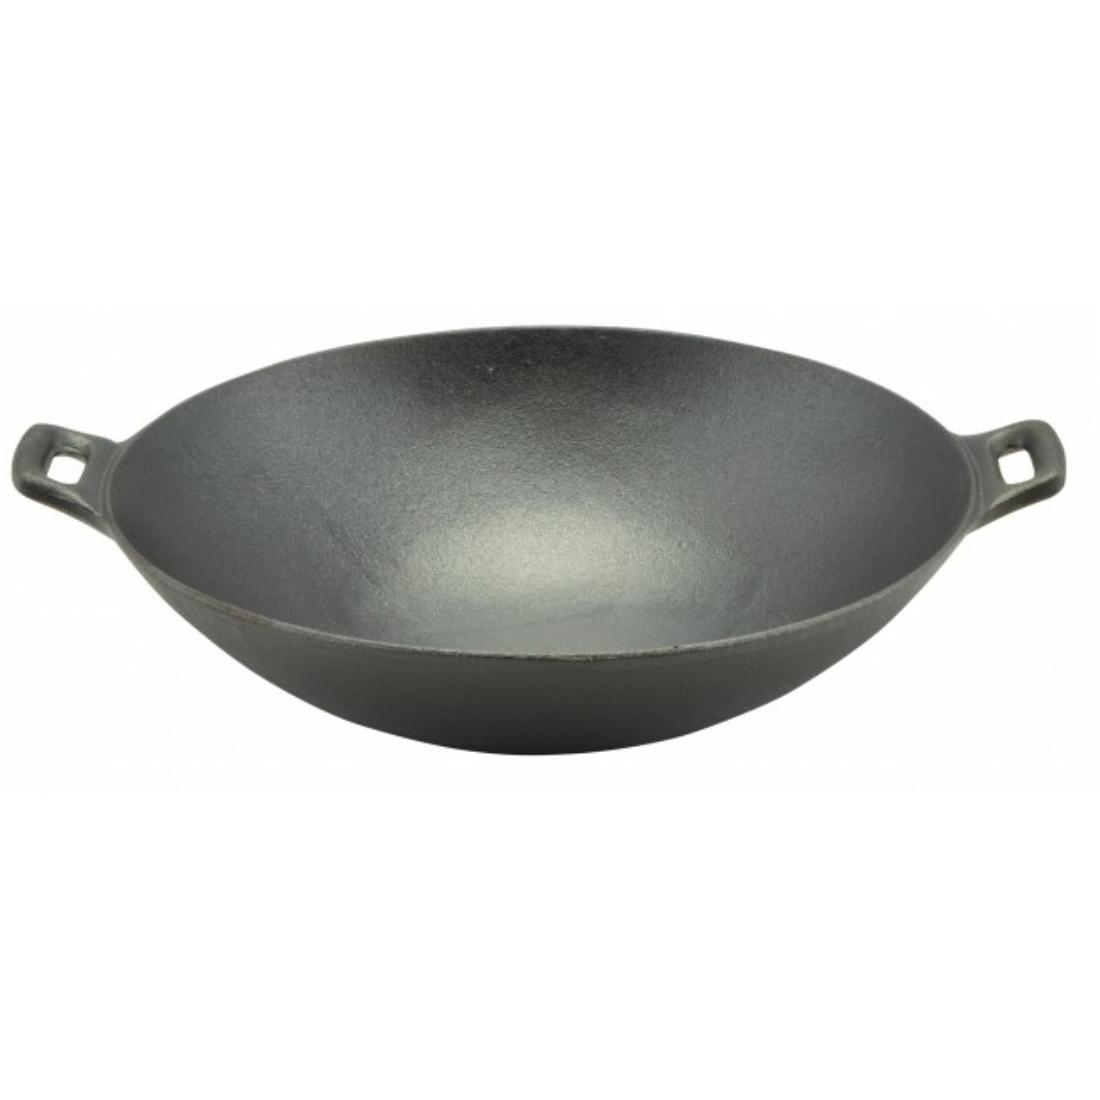 Öntöttvas wok 36.6 cm